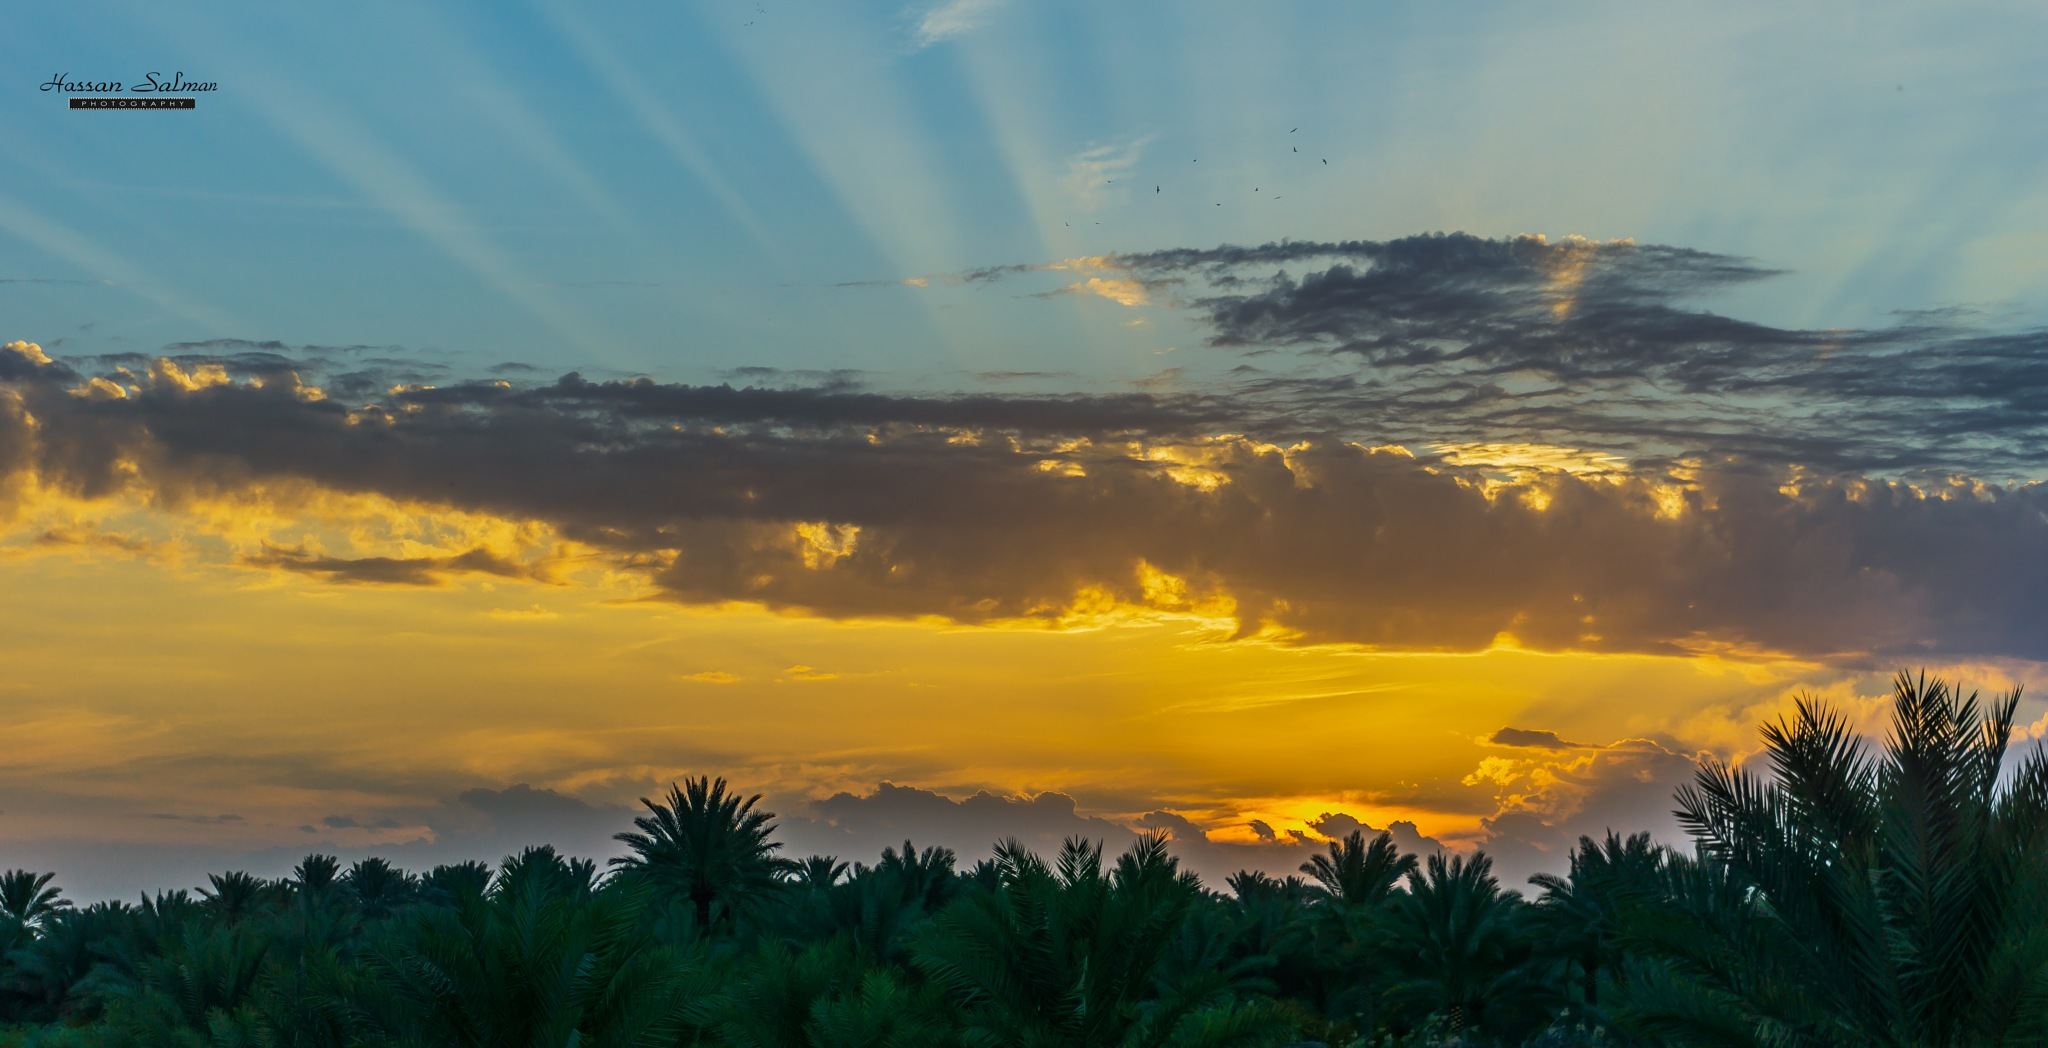 sunset form karbala by hassansalman